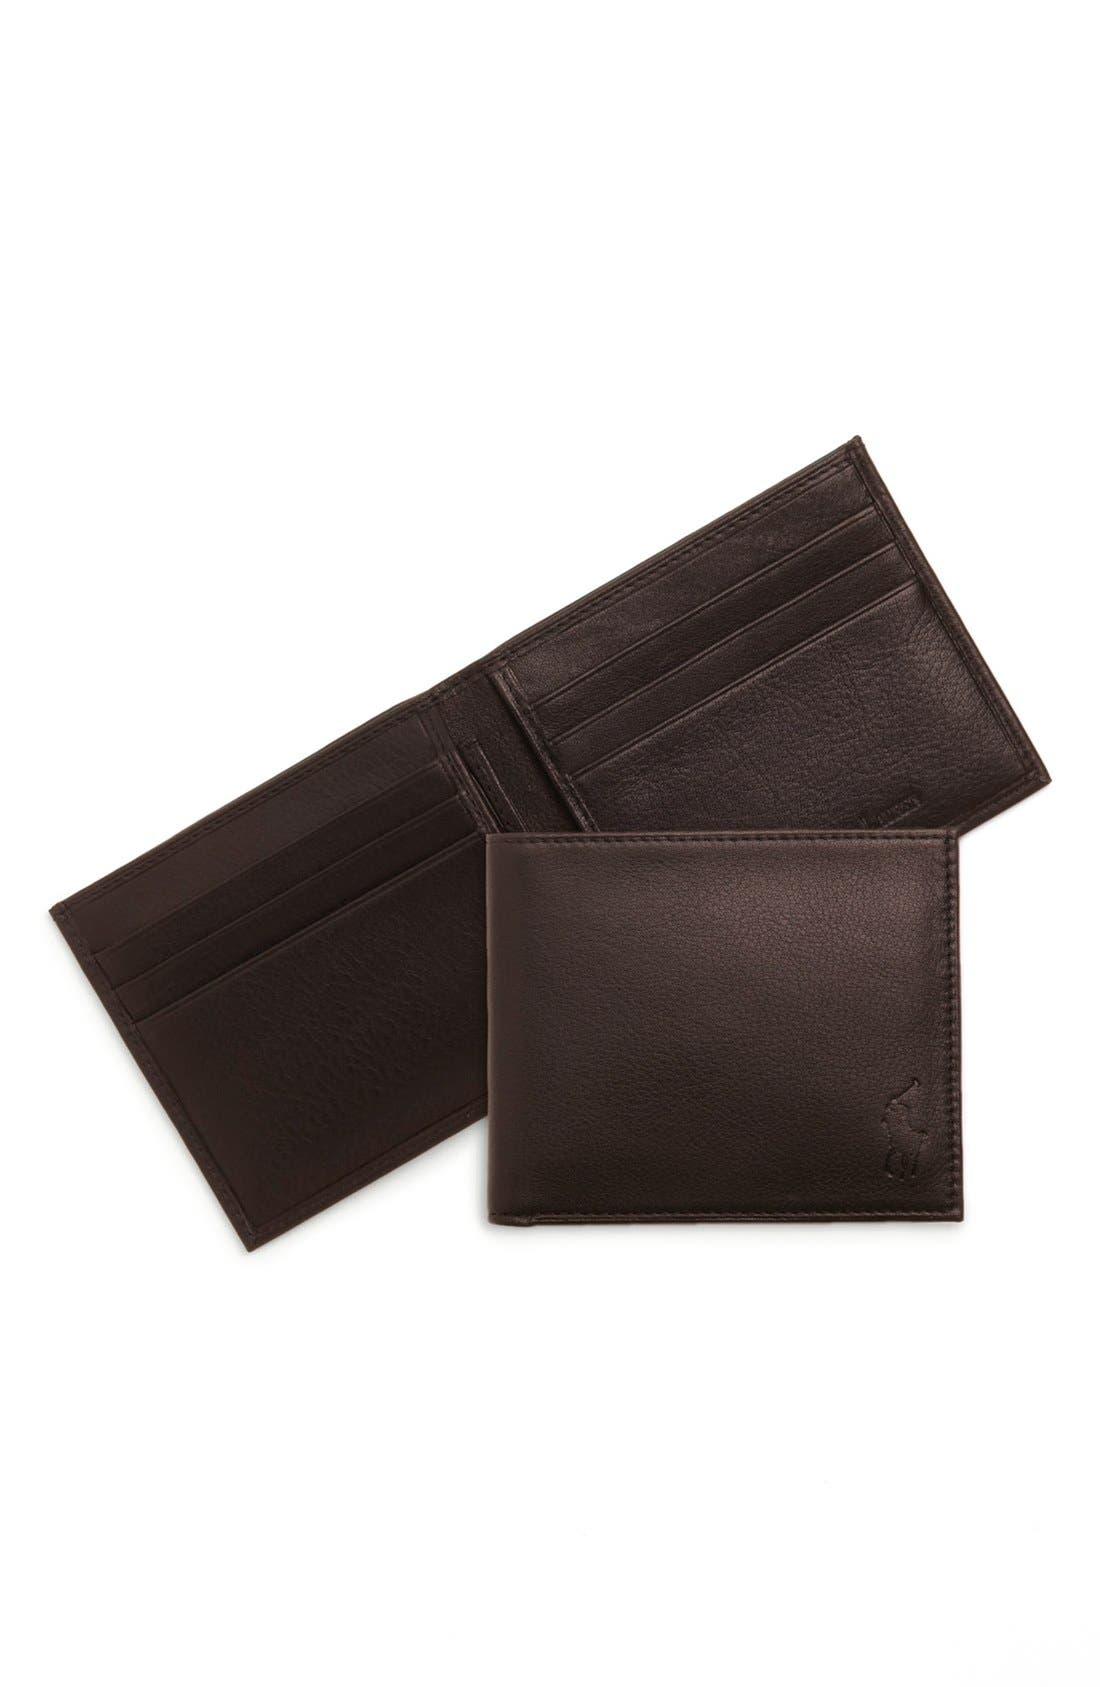 Main Image - Polo Ralph Lauren Bifold Wallet